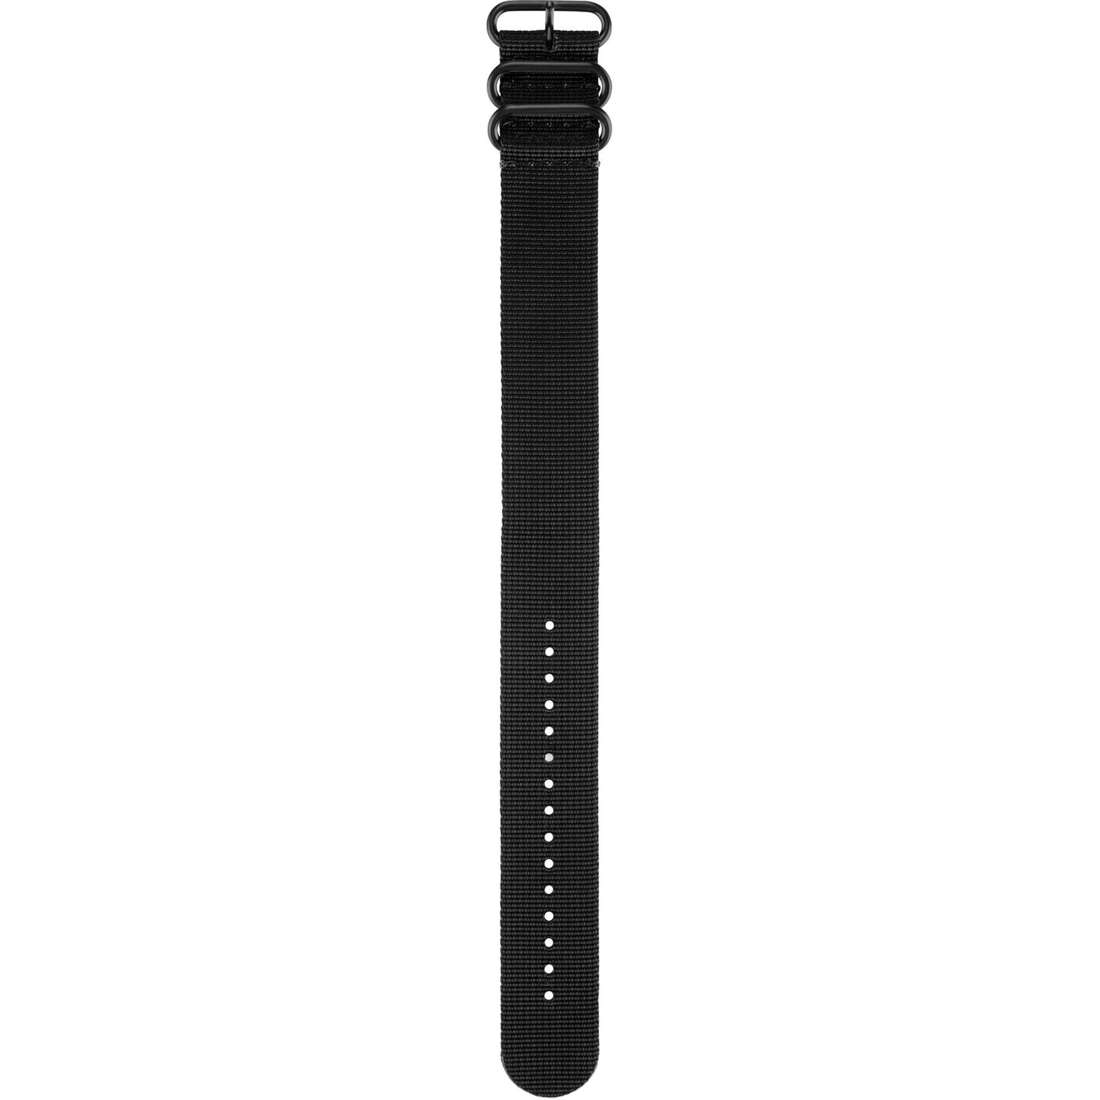 orologio accessorio unisex Garmin 010-12168-23